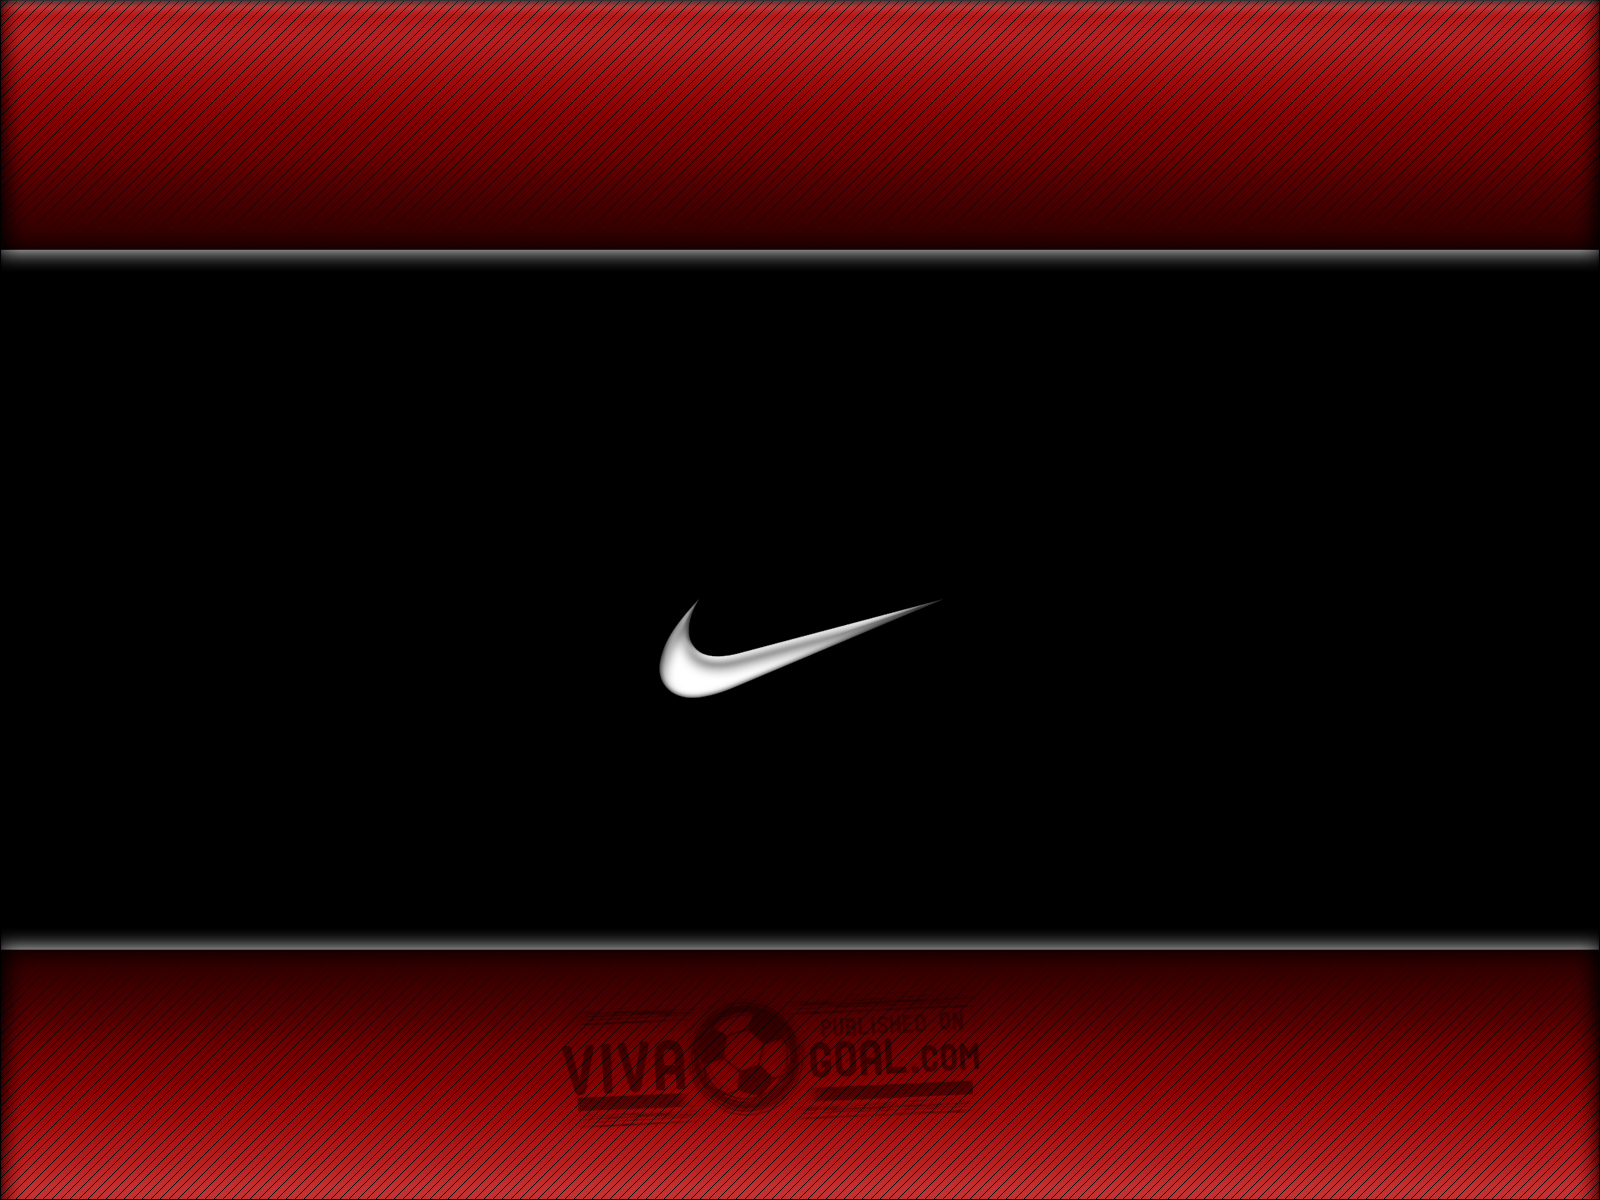 Nike Football Mac Desktop Wallpaper Hd   Football Wallpaper HD 1600x1200